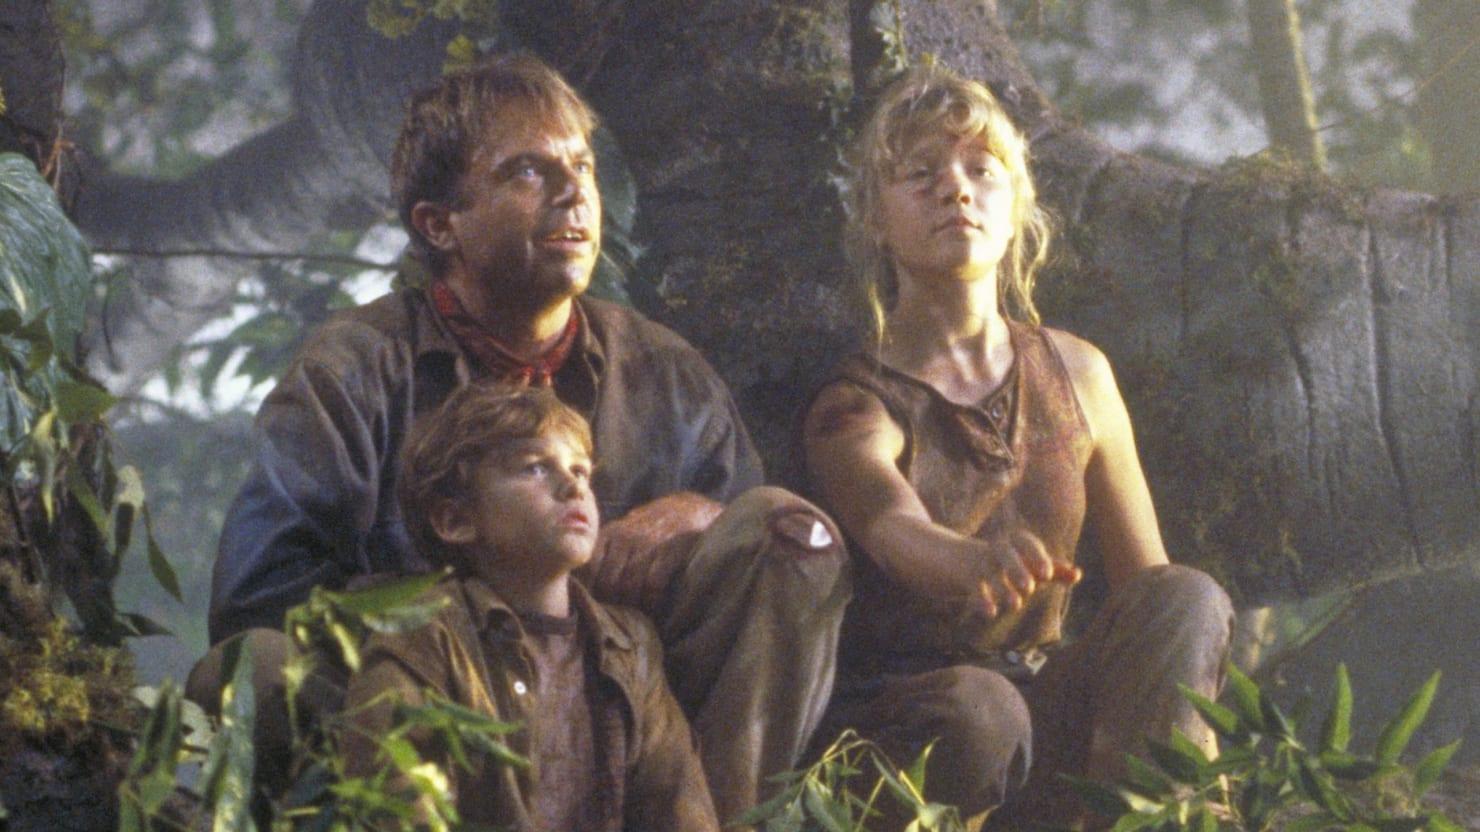 Jurassic Park Turns 20 Film Memories With Ariana Richards